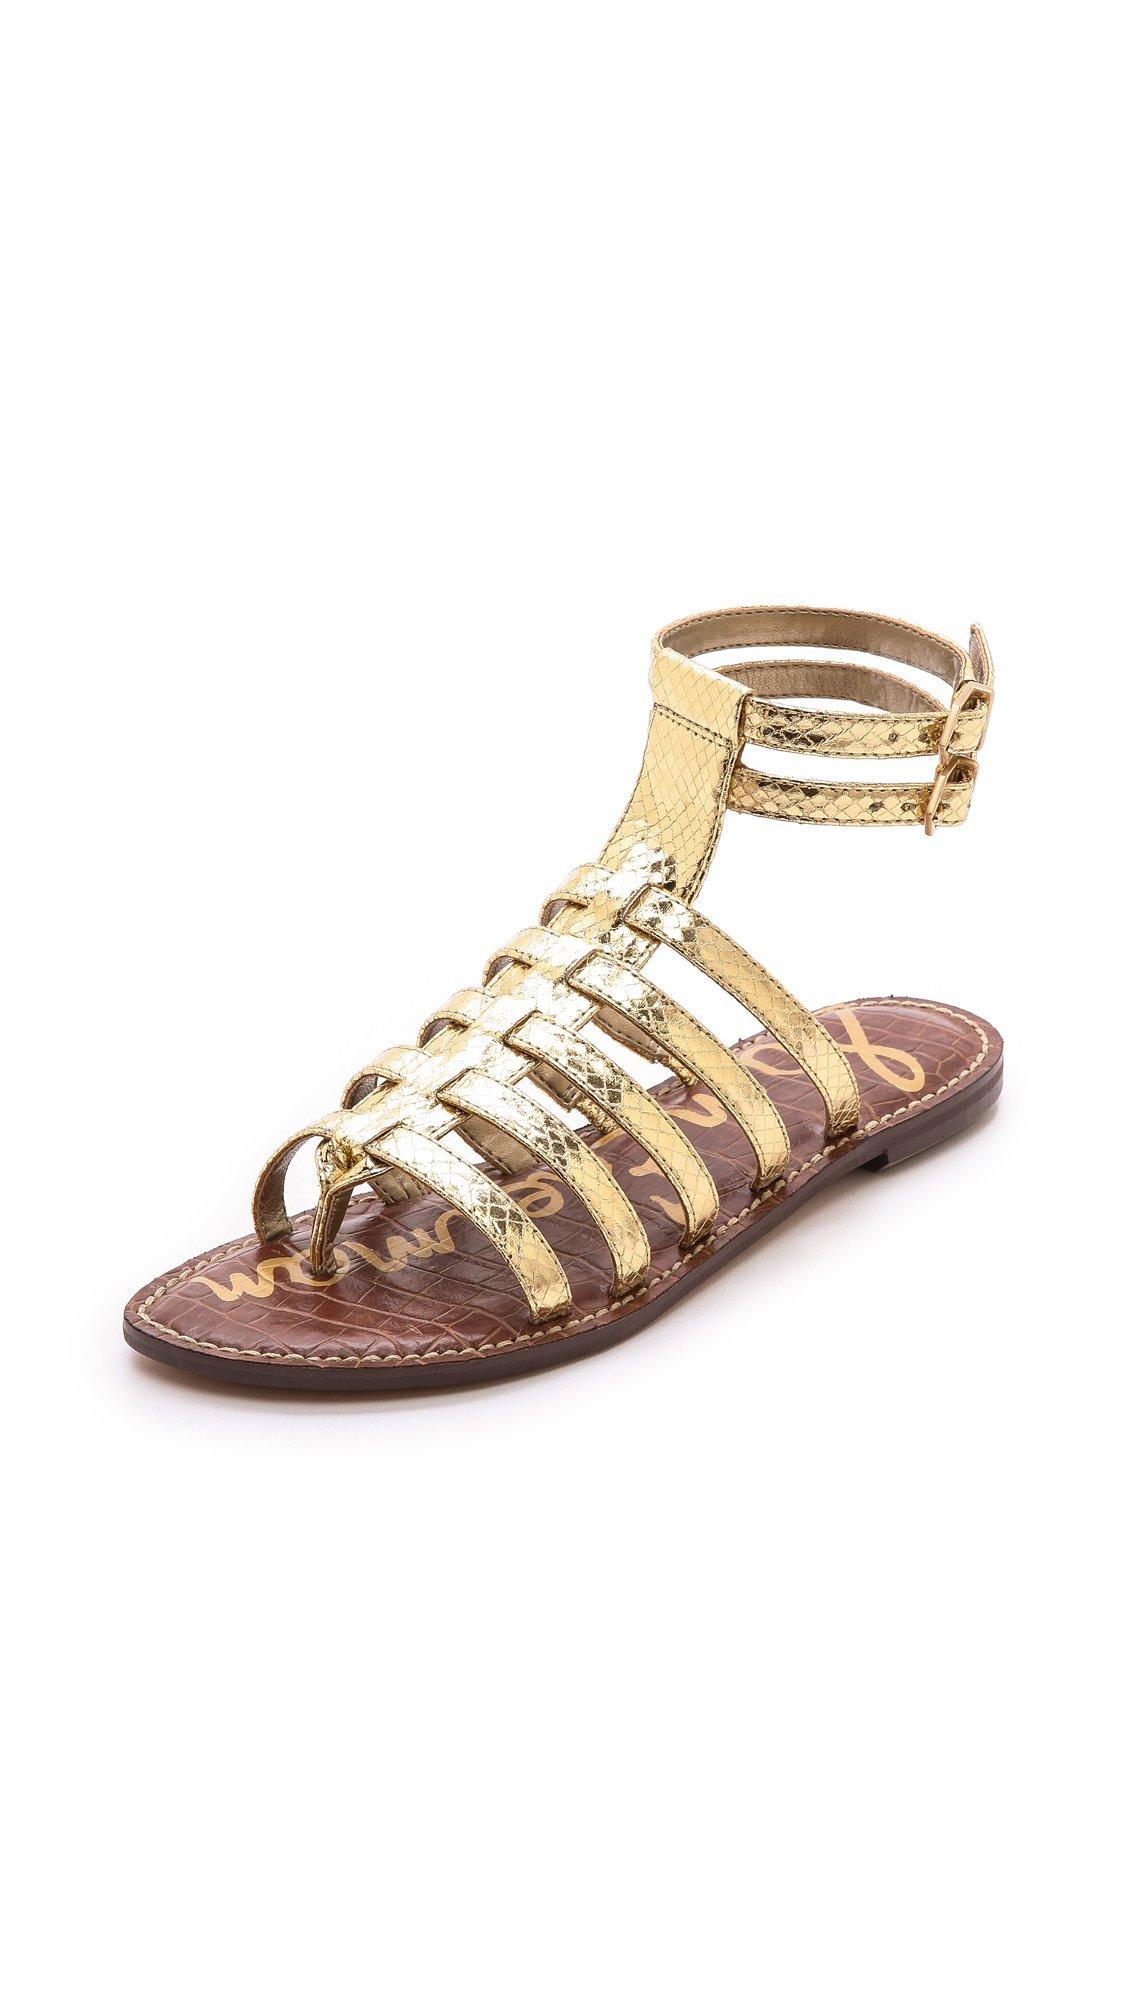 Sandals Gold Gladiator Sandals